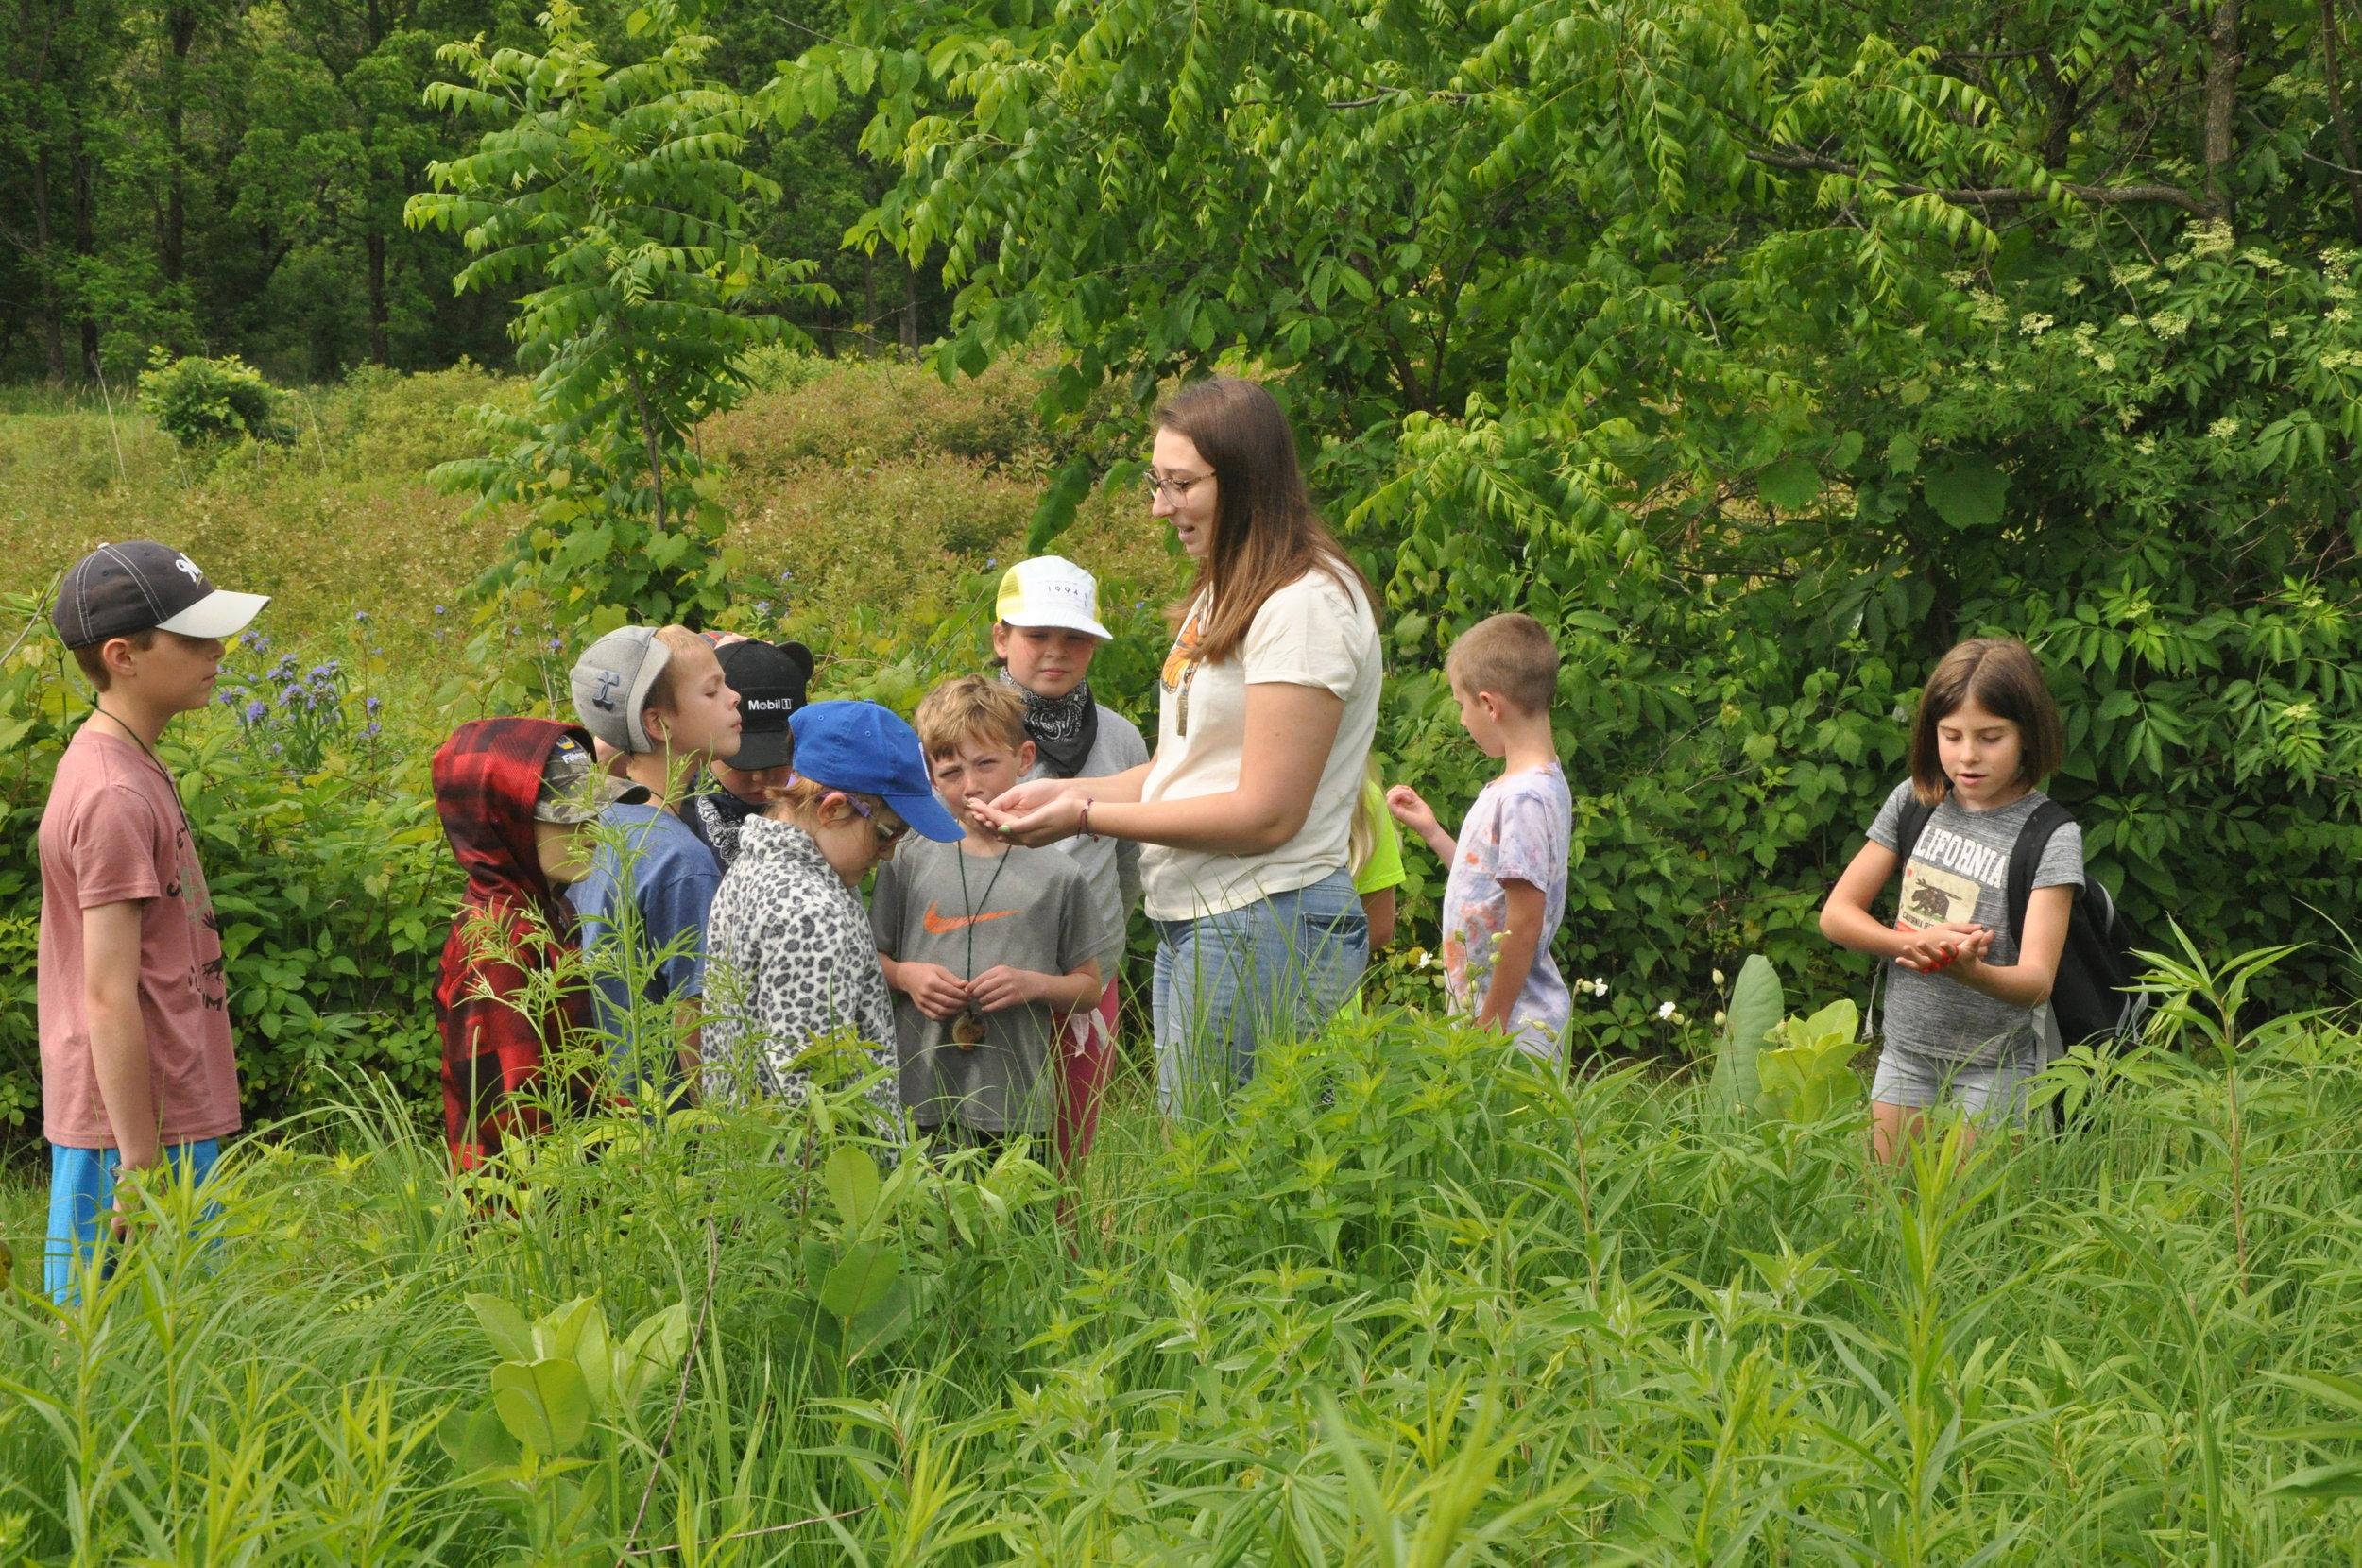 Blog — Severson Dells Nature Center